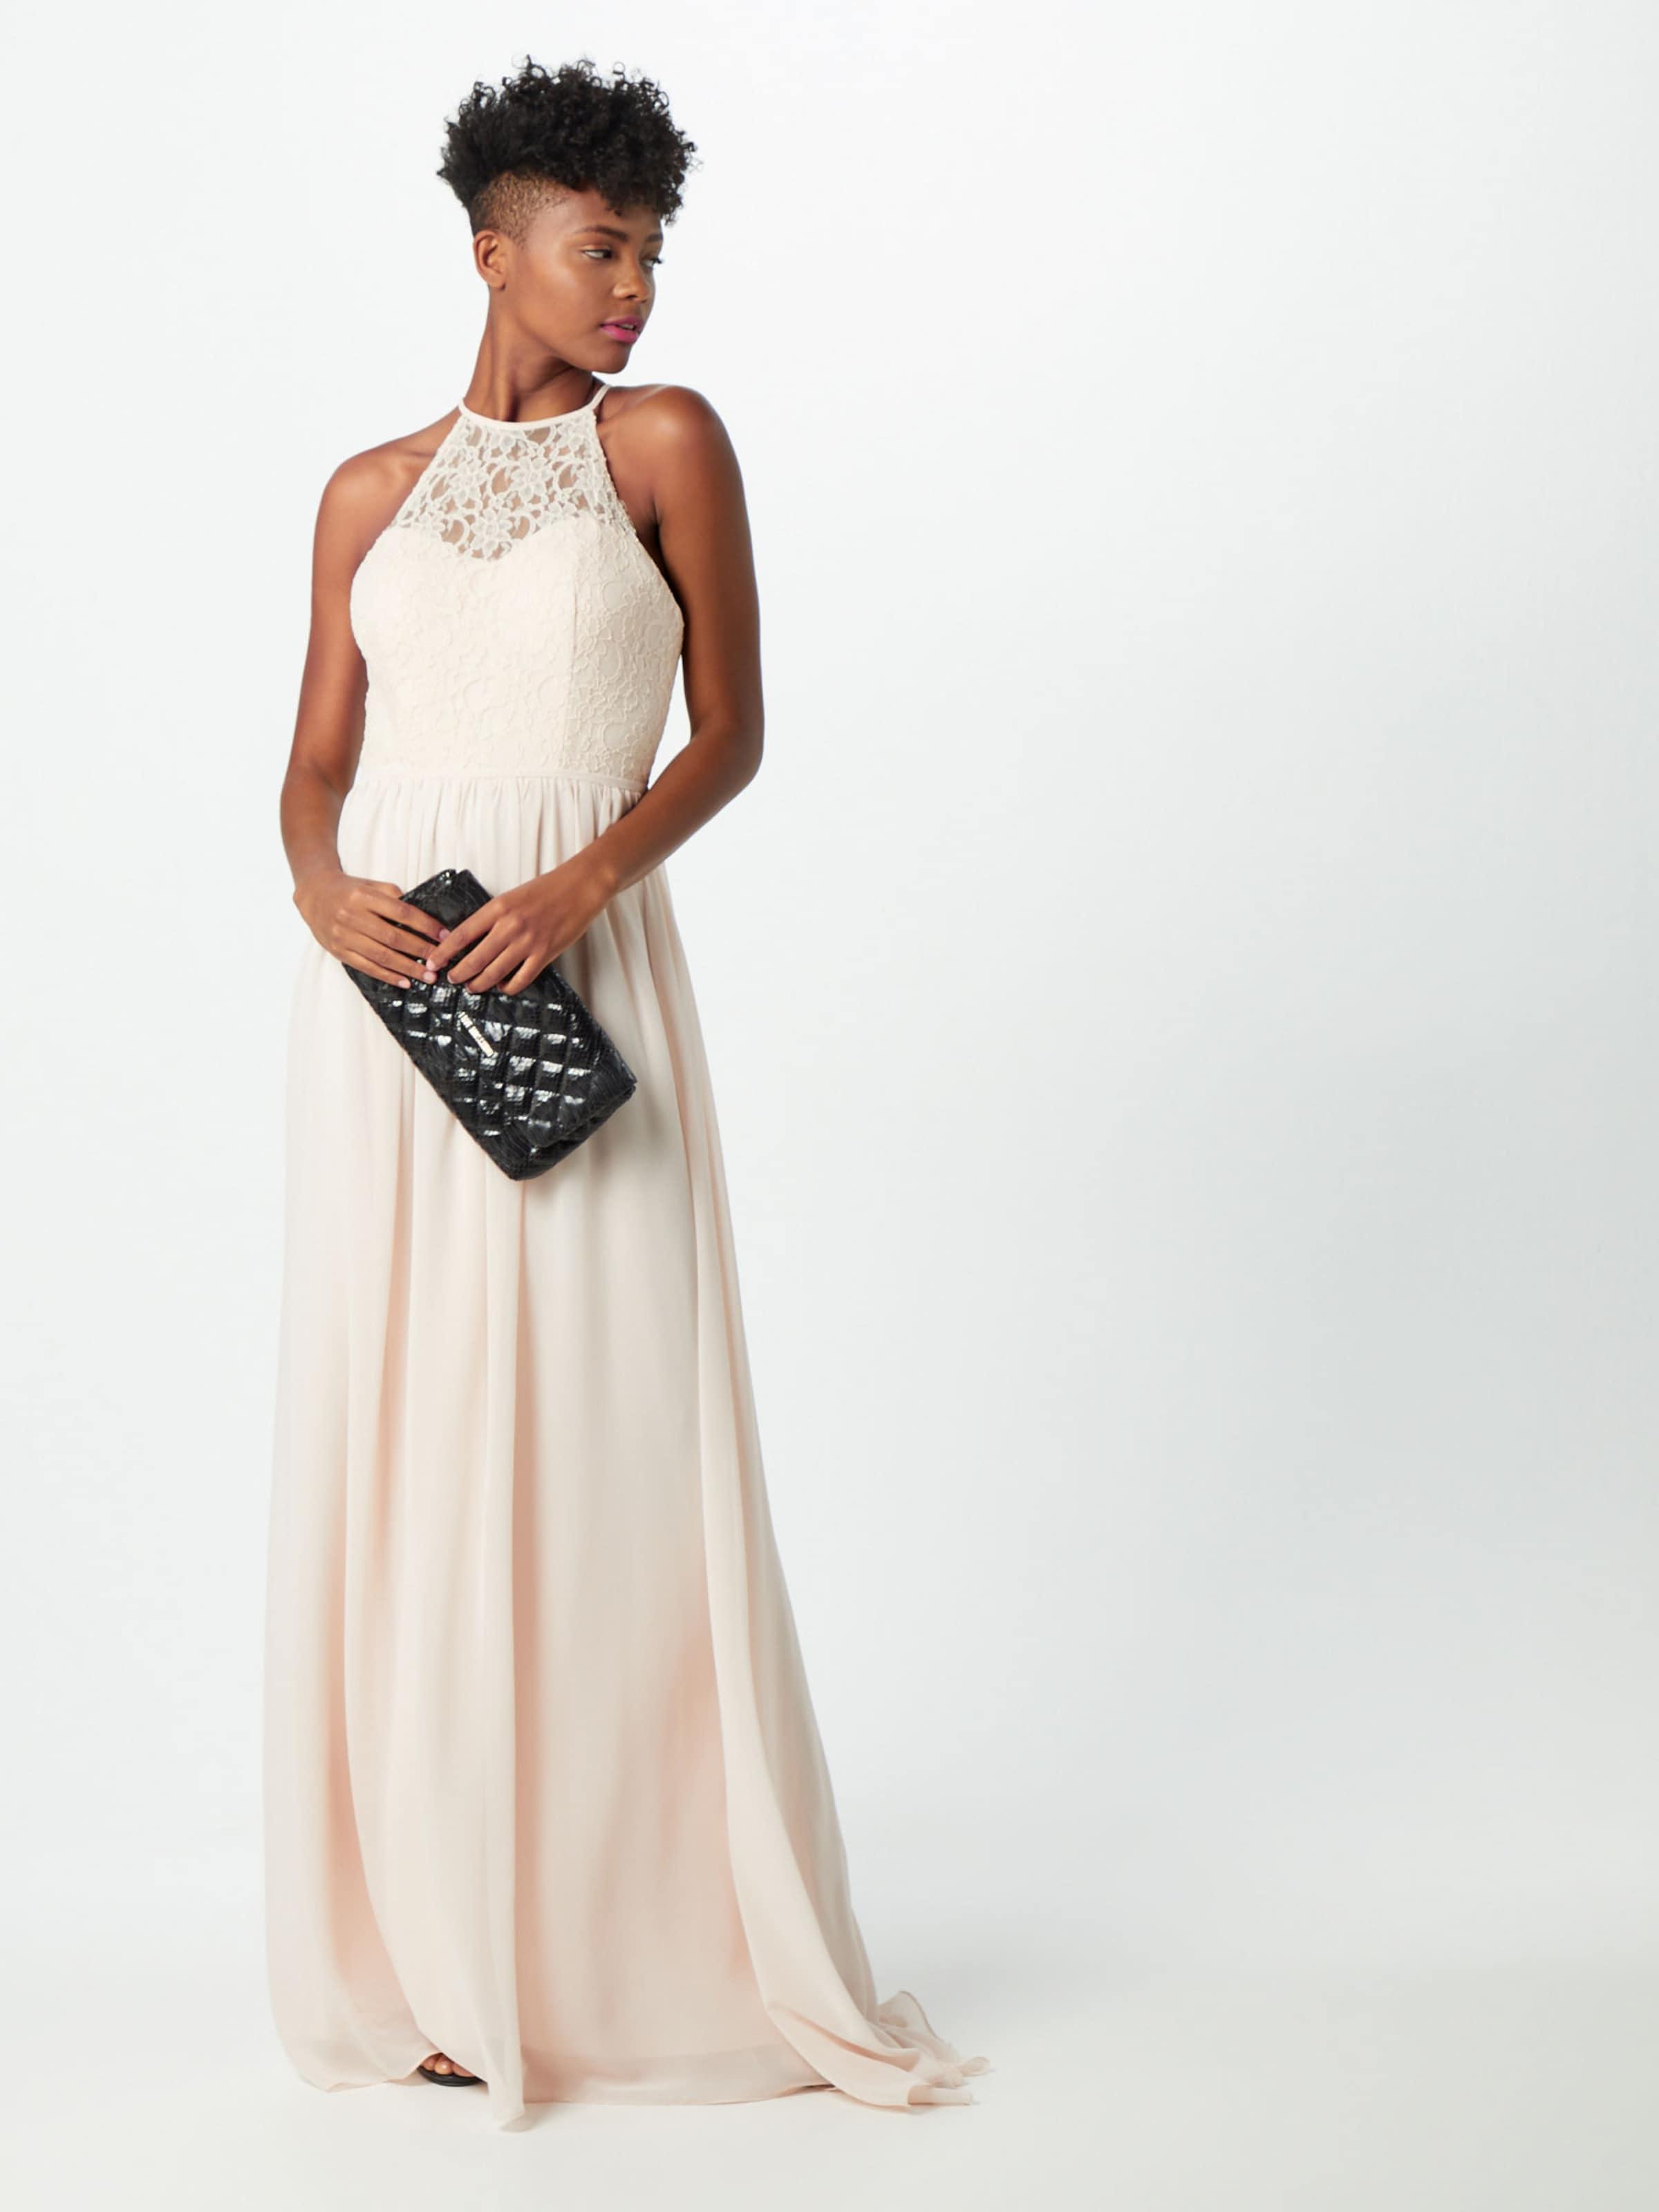 'long De Star En Corded Laceamp; Night Rose Soirée Dress Chiffon' Robe CBedox